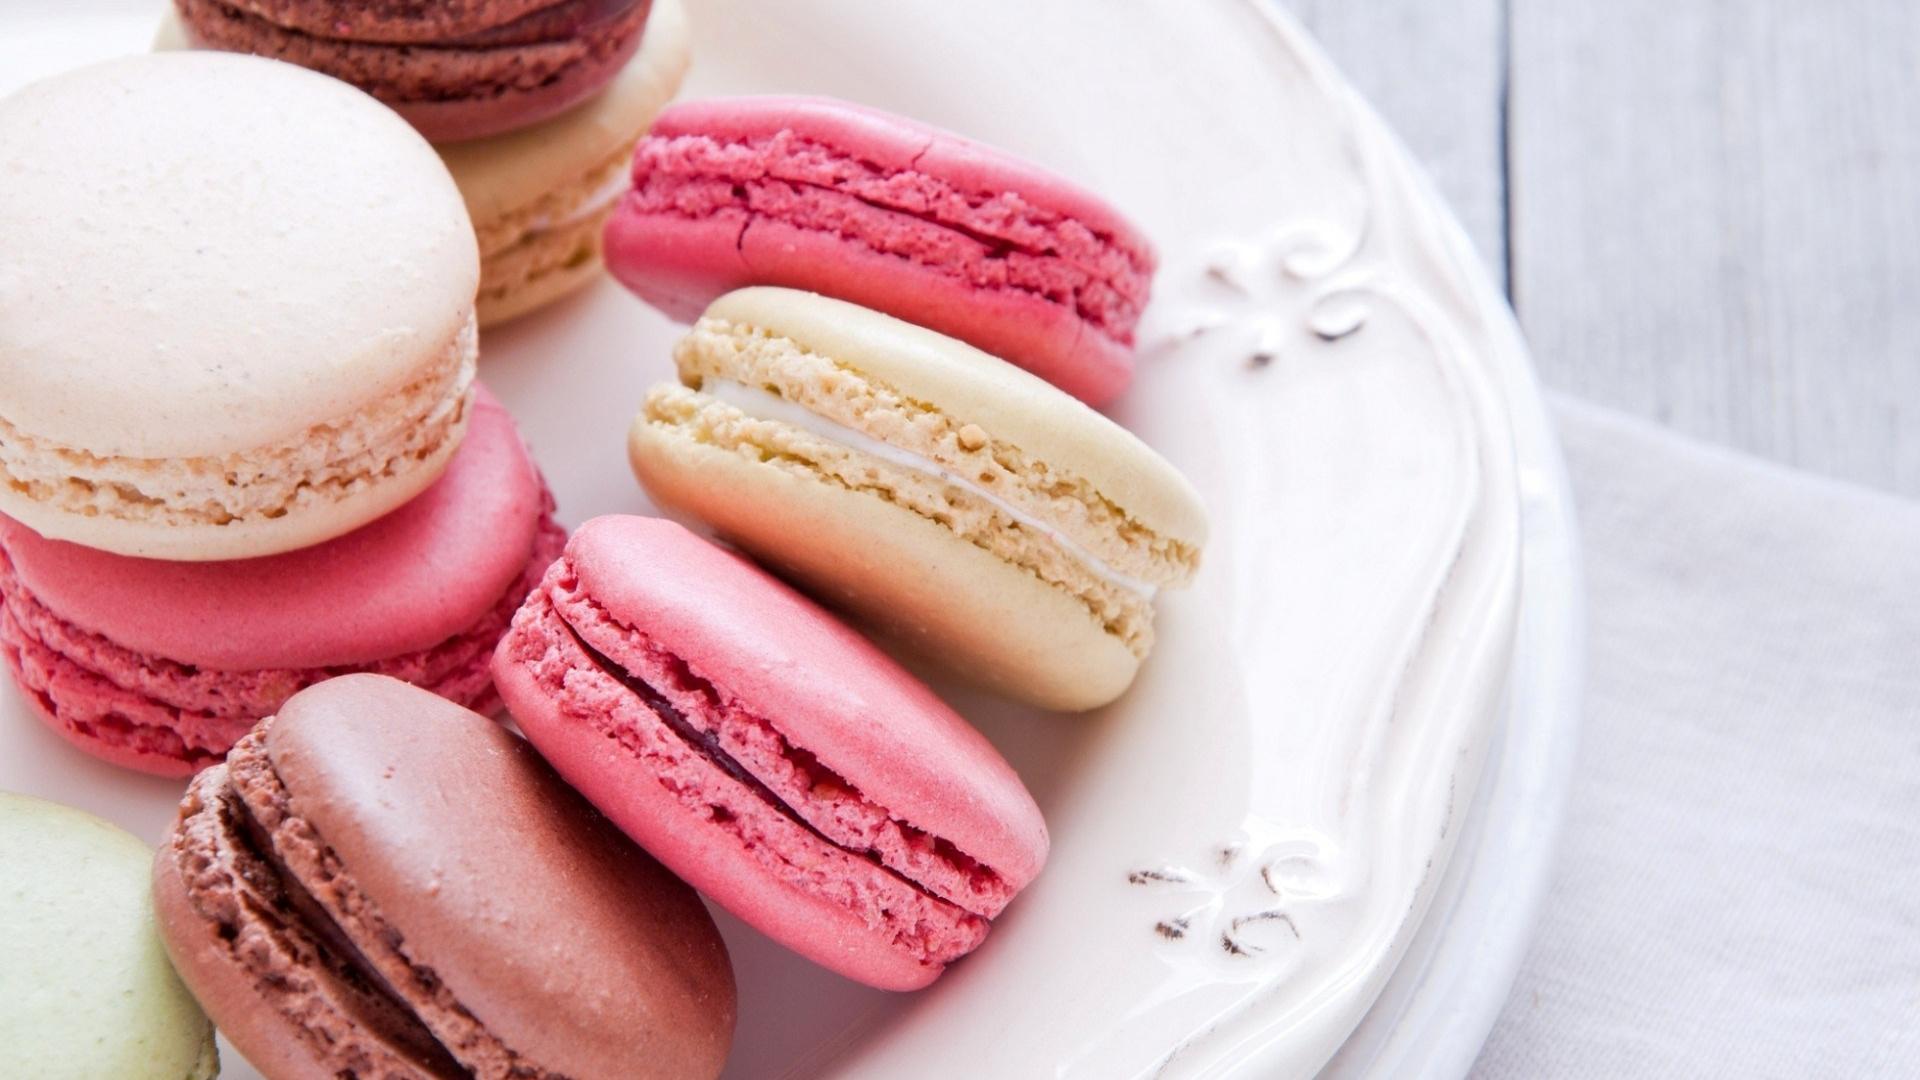 Free download Cute Dessert Wallpaper Cookies sweets dessert ...